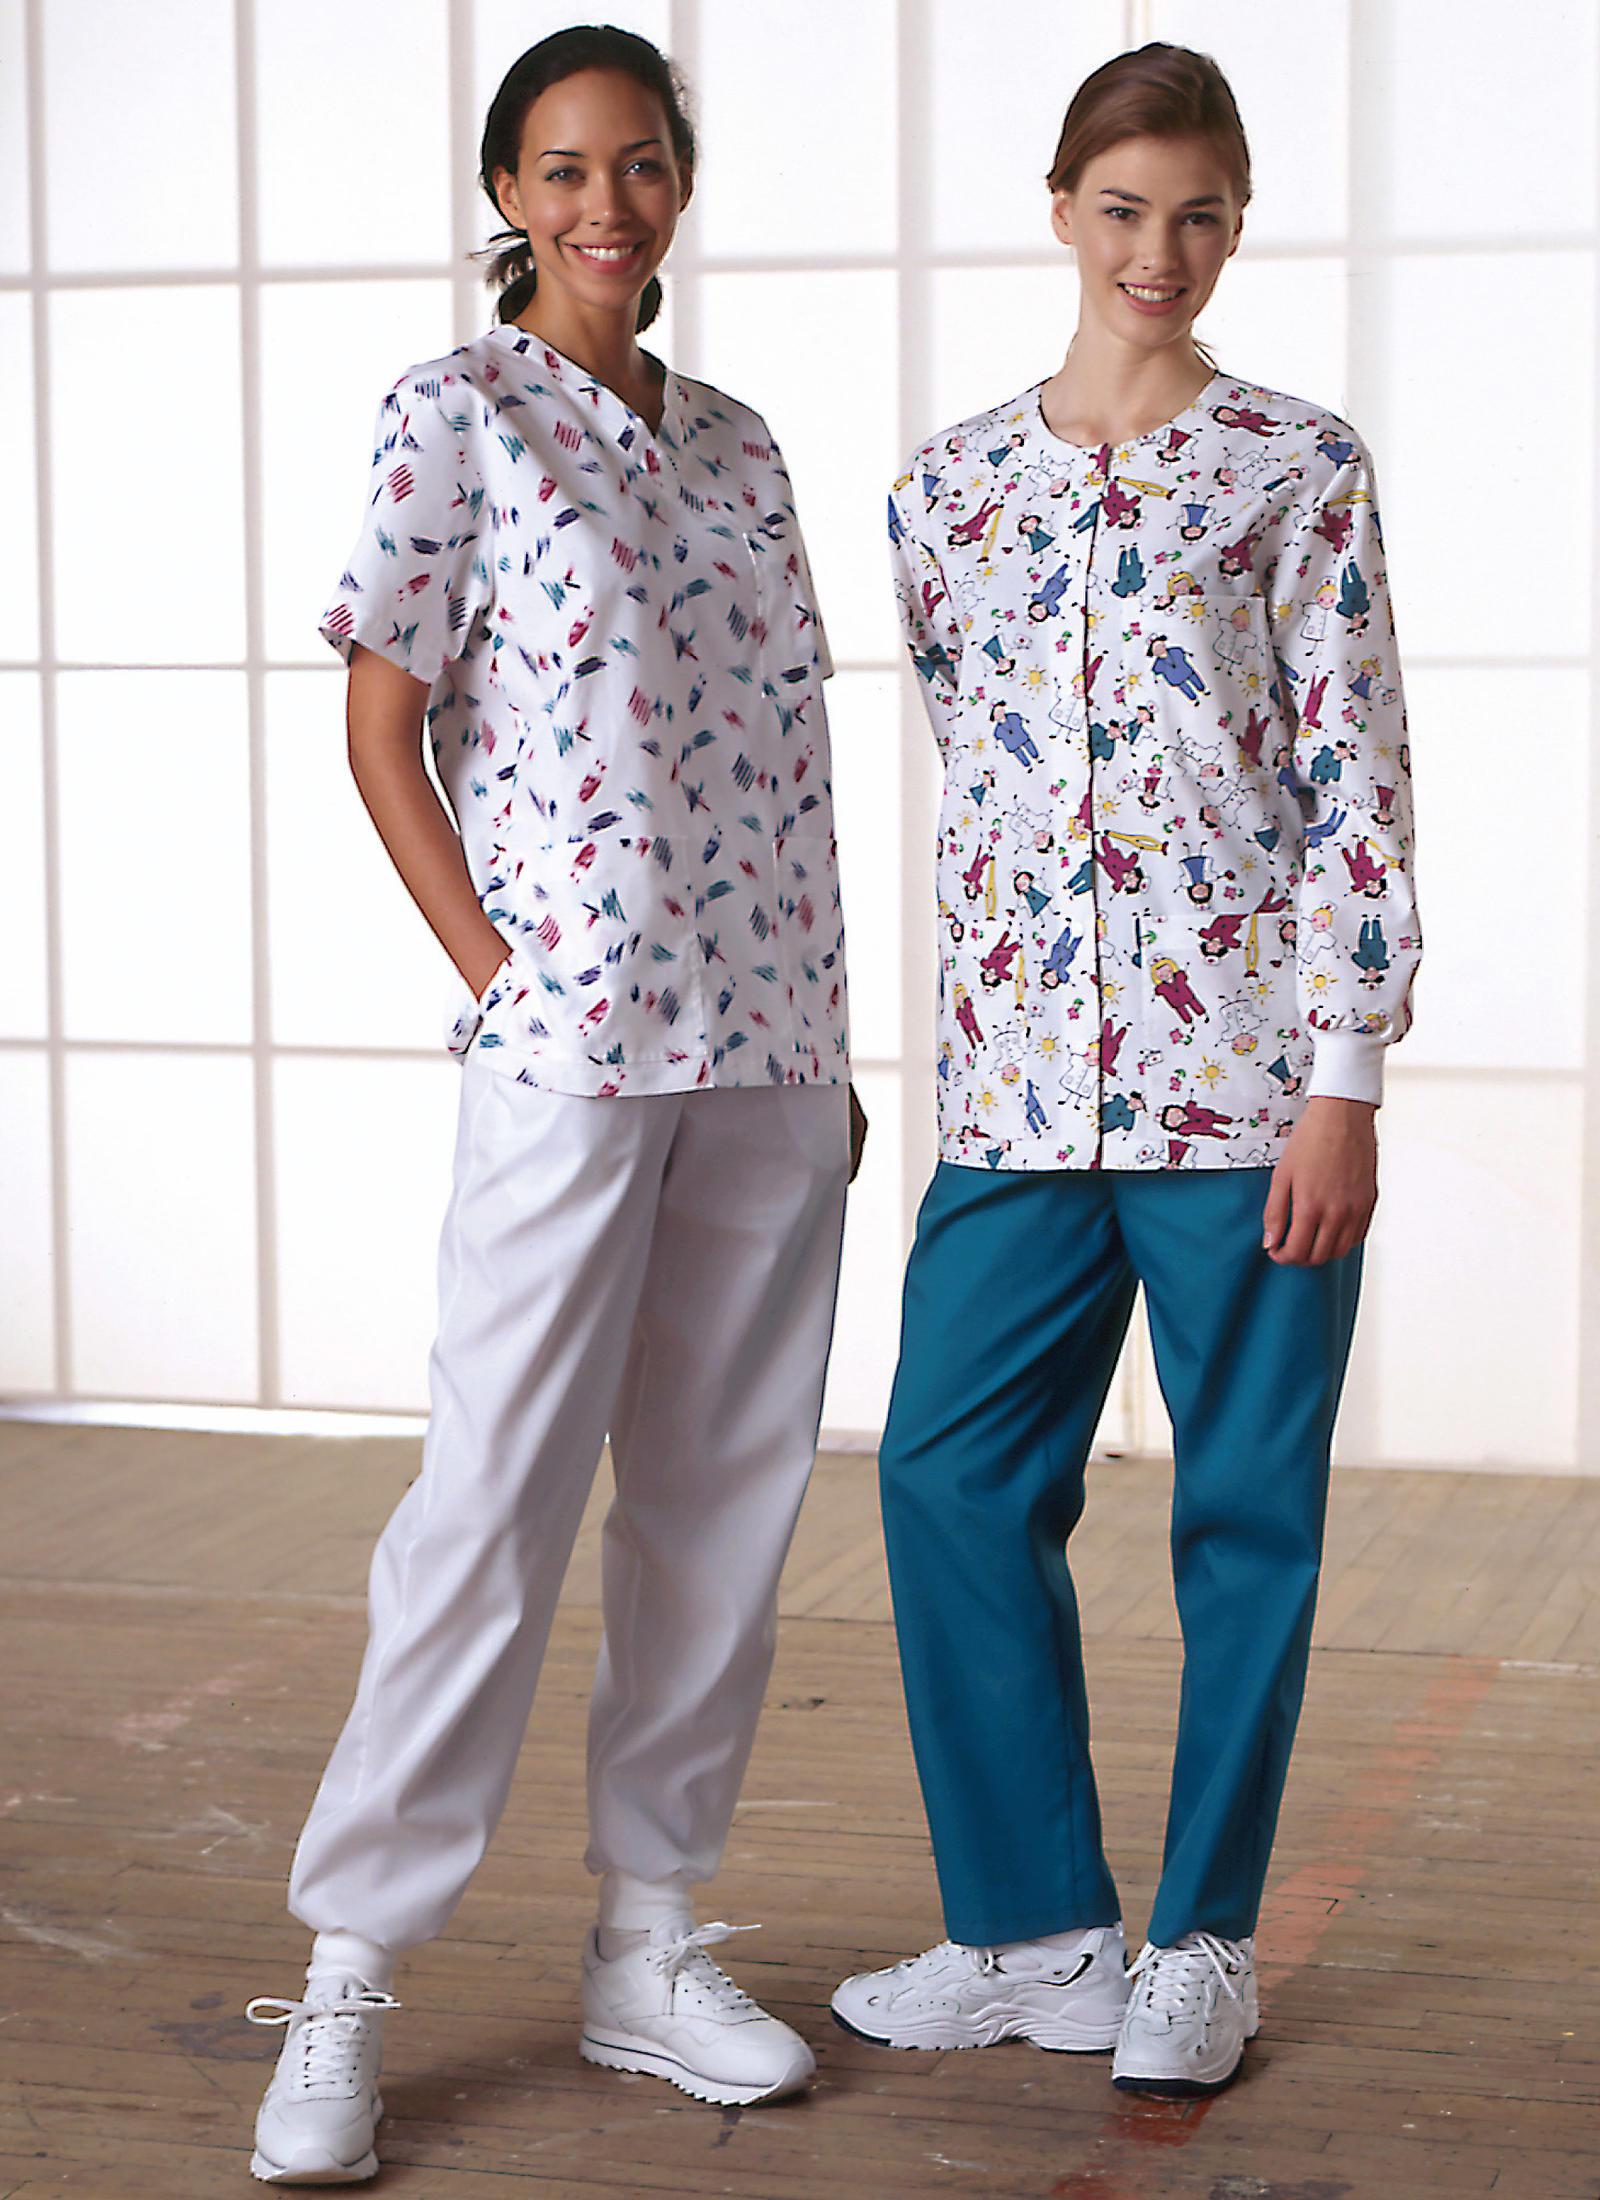 Kwik Sew - Misses' Scrubs with Pockets - Sizes S-XL - K2807